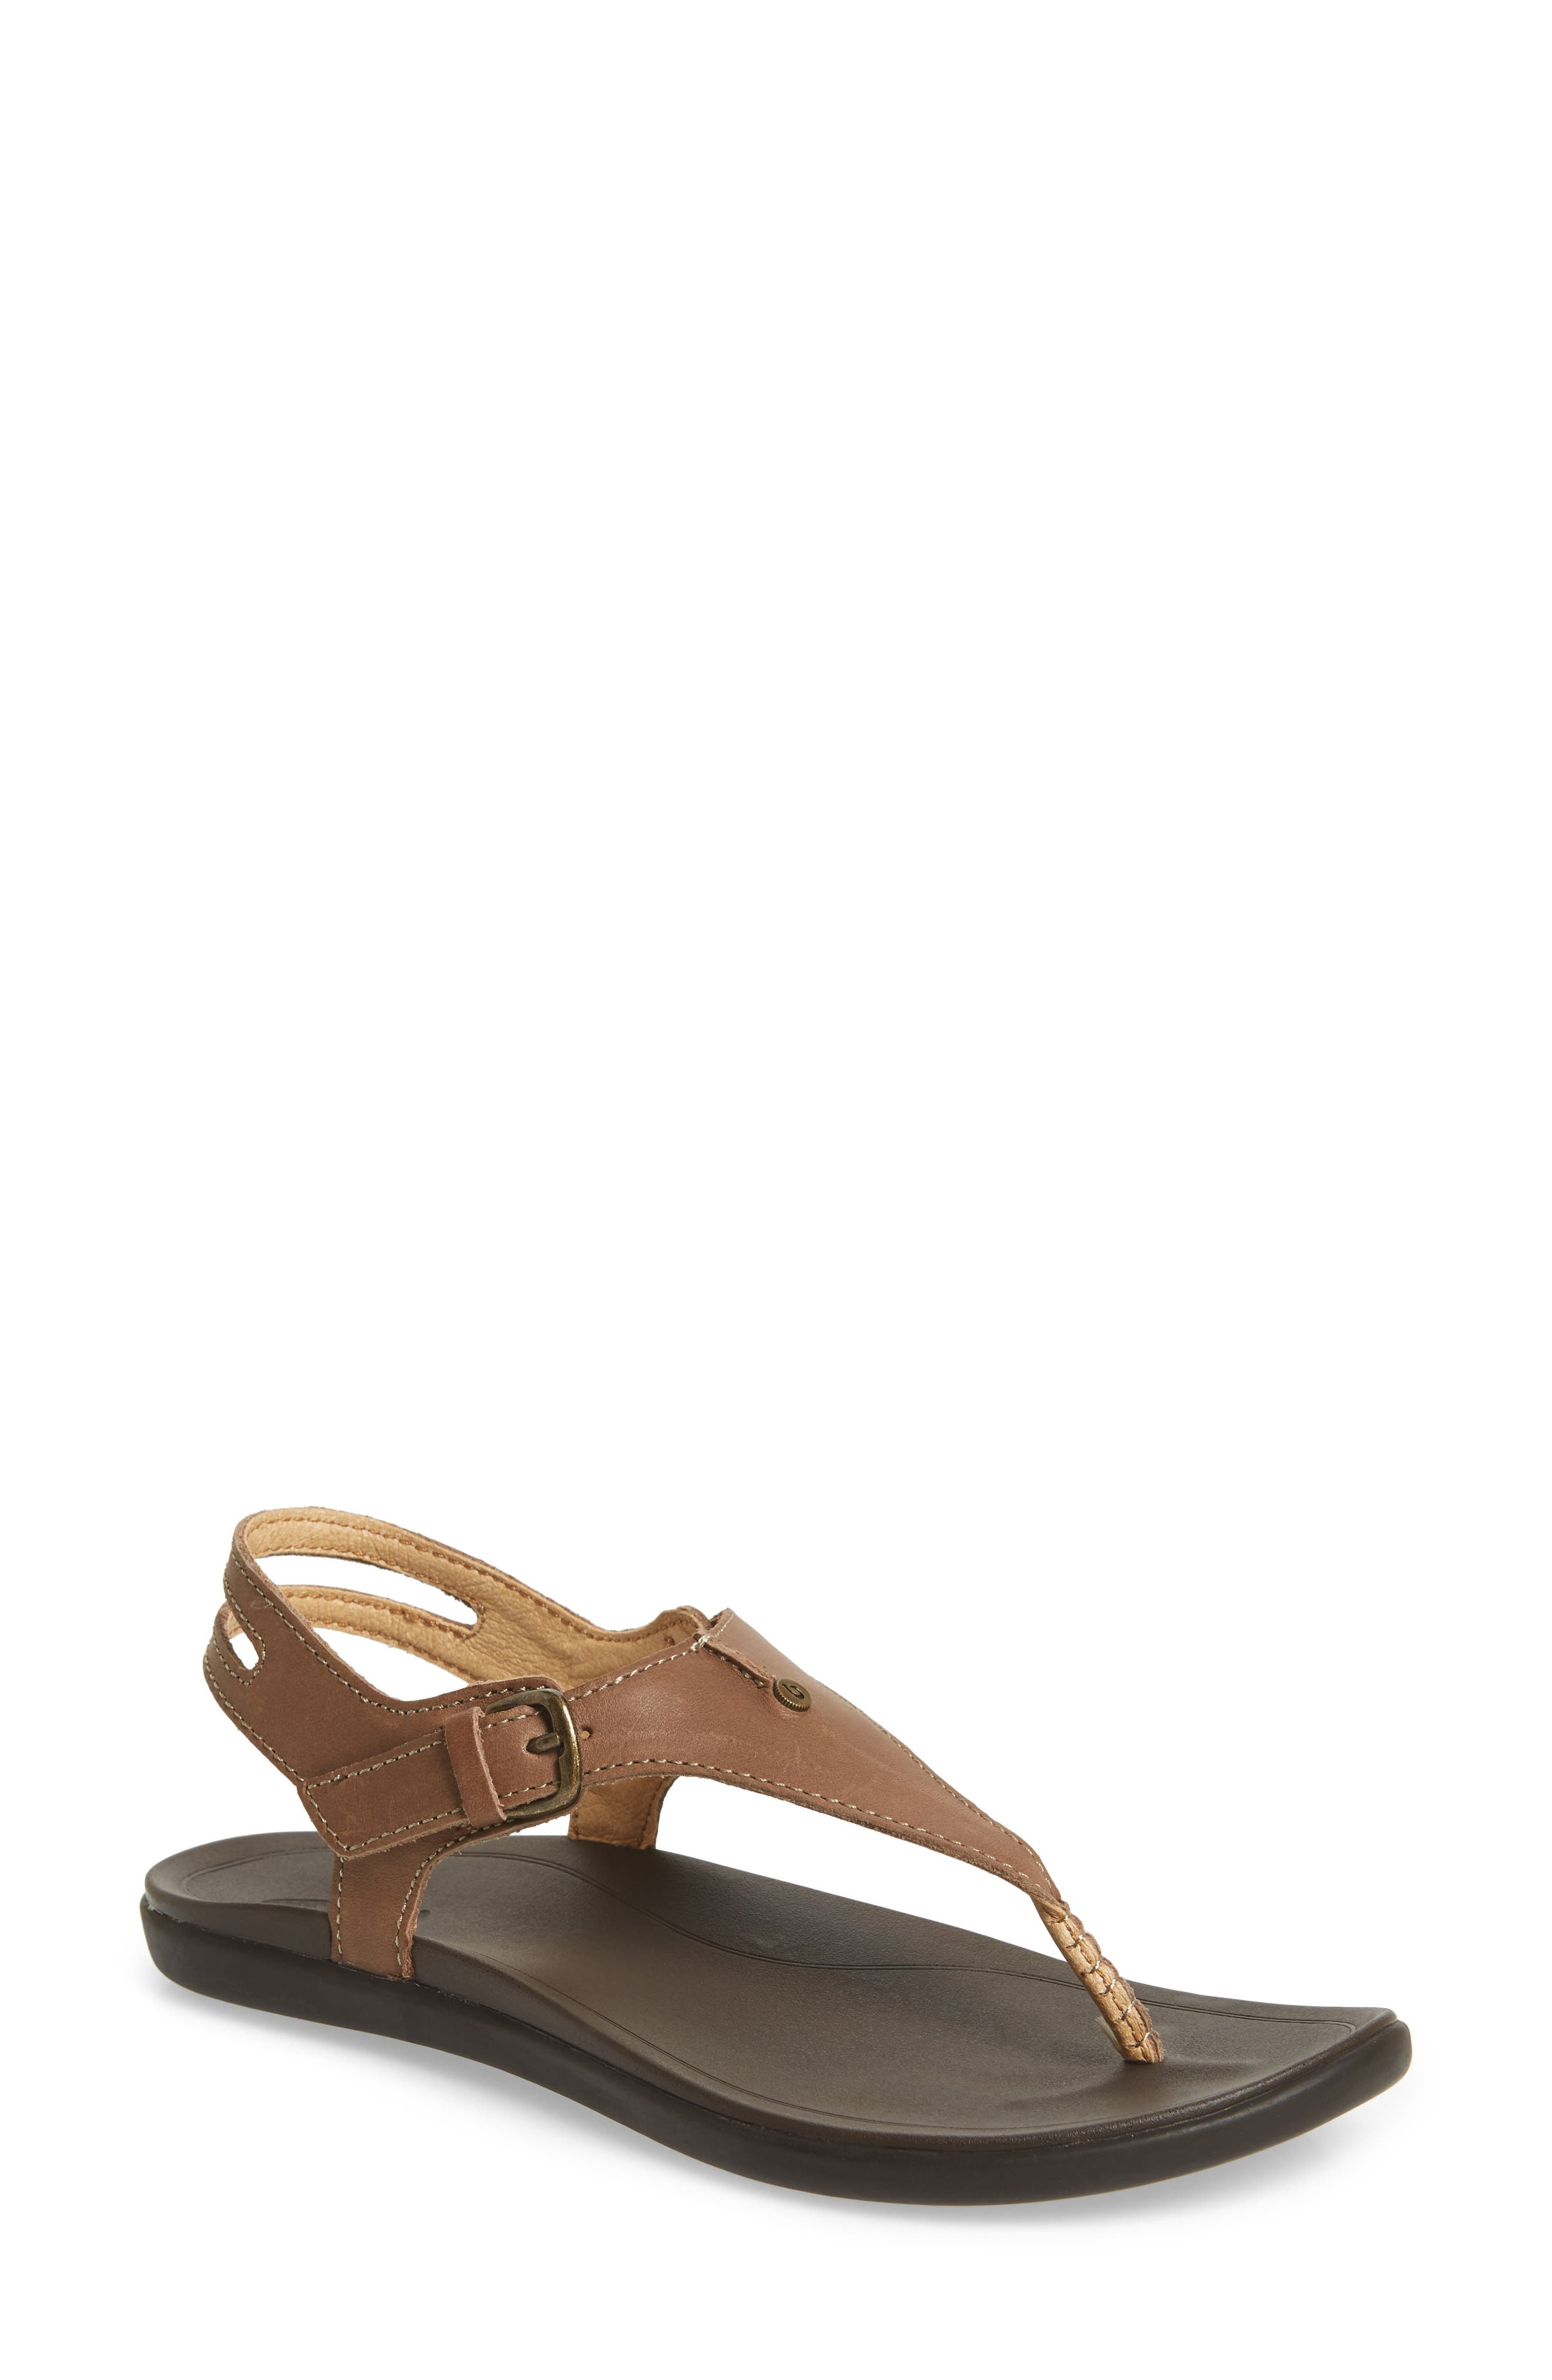 'Eheu V-Strap Sandal,                             Main thumbnail 1, color,                             Clay/ Dark Java Leather